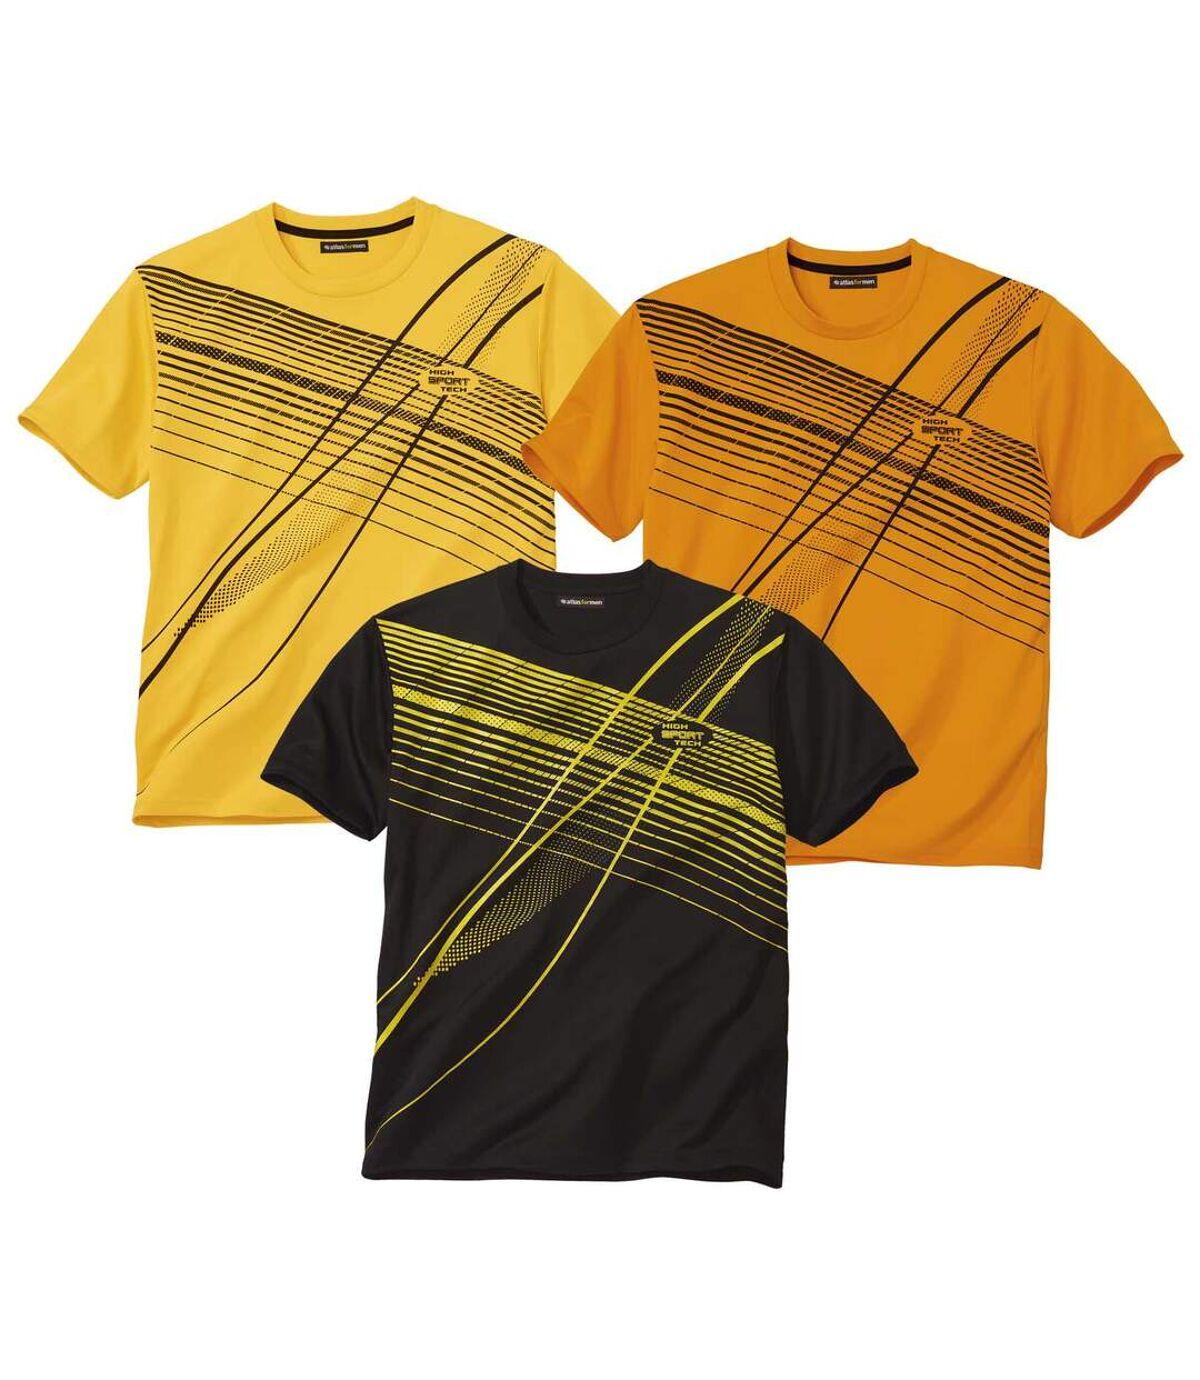 Pack of 3 Men's Sports T-Shirts - Yellow Orange Black Atlas For Men